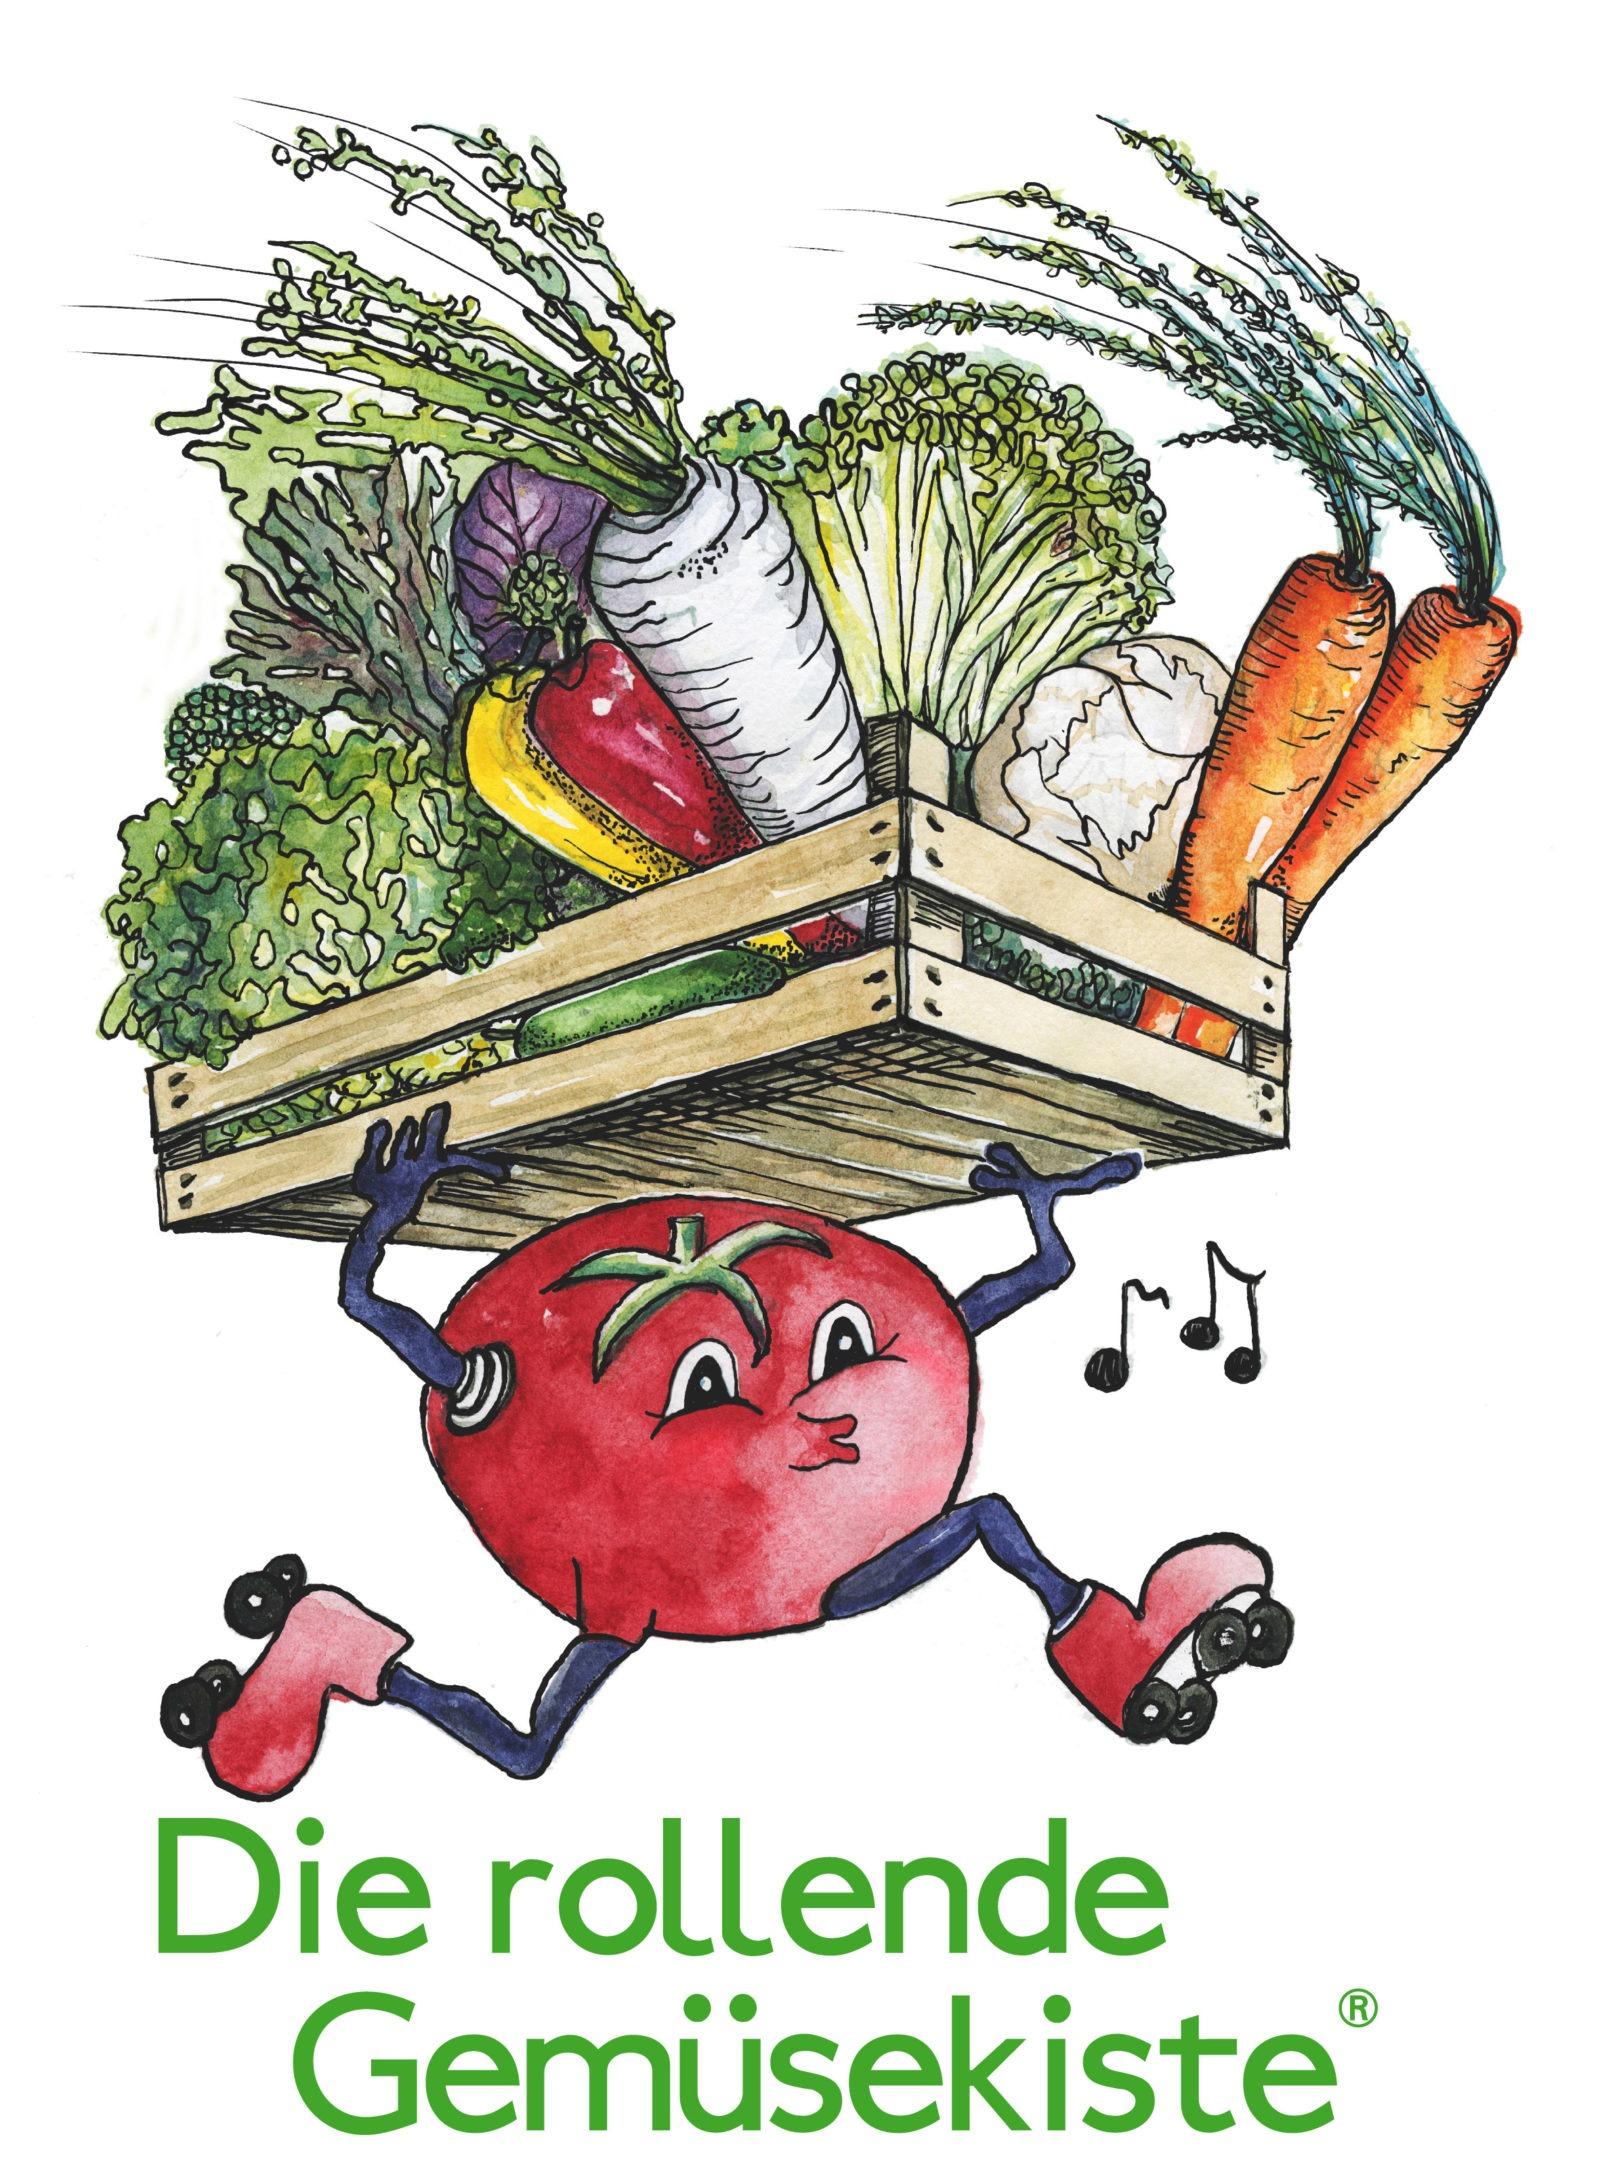 rollende Gemüsekiste